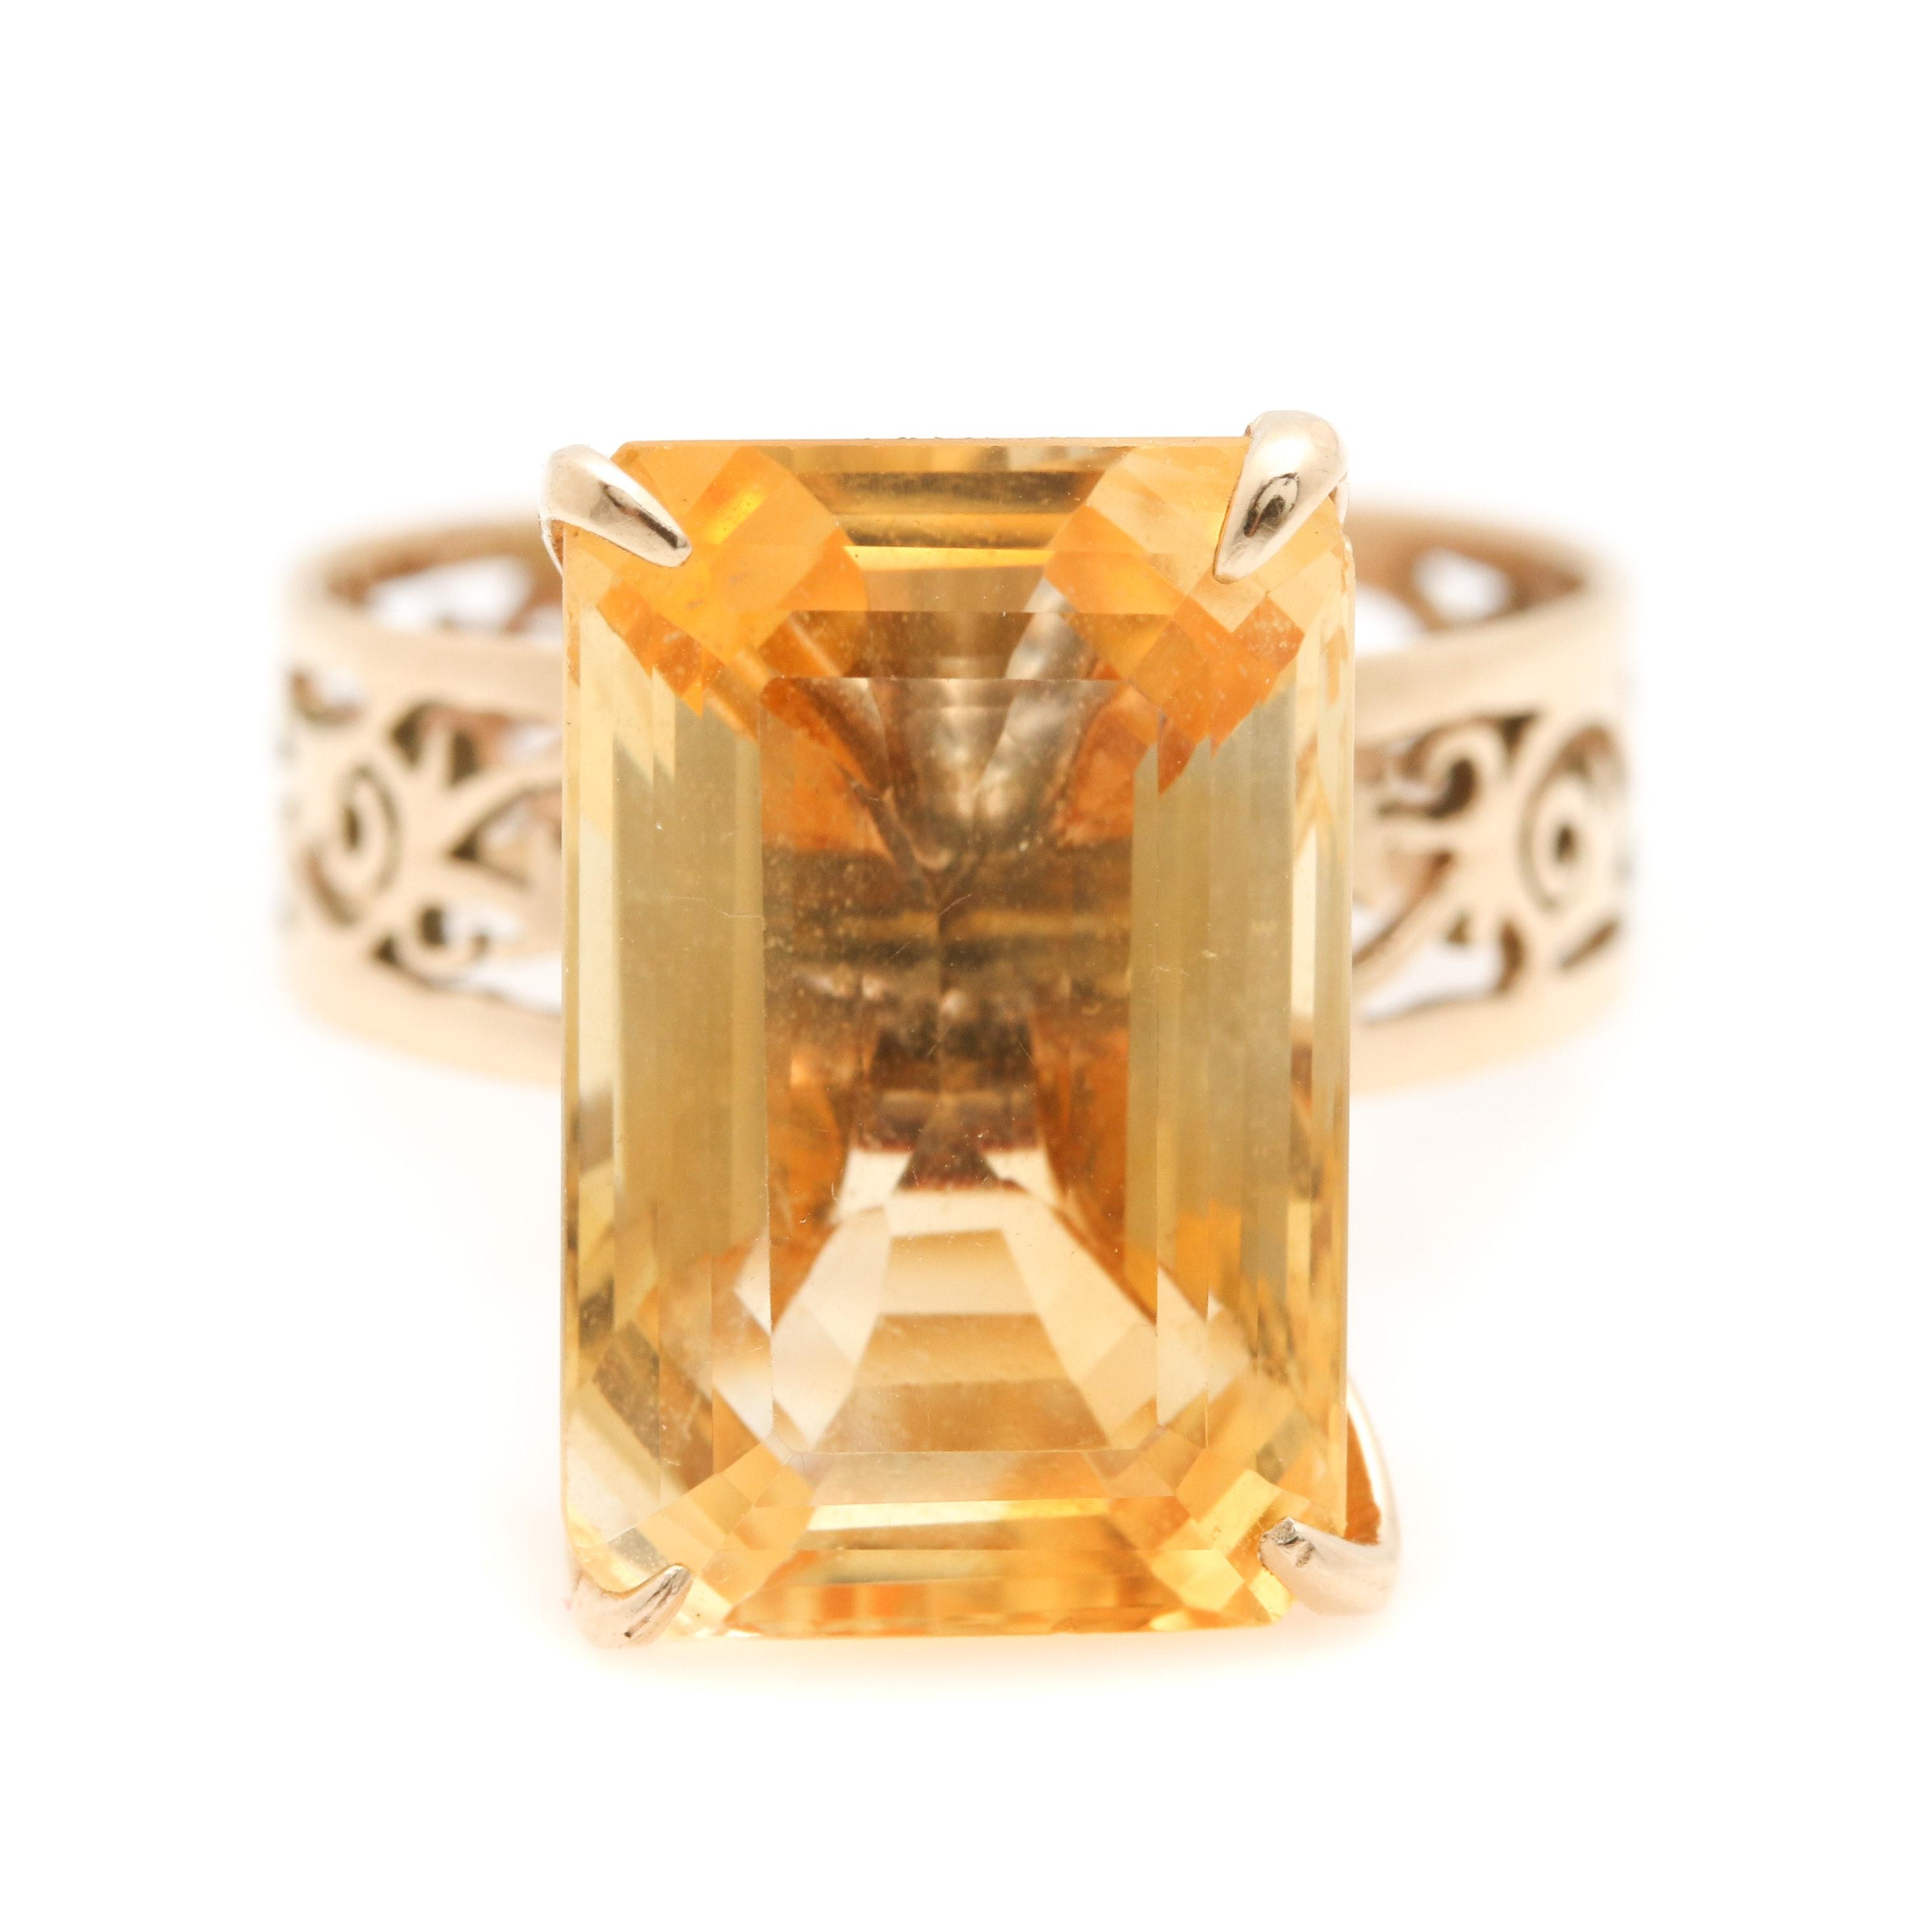 14K Yellow Gold 7.93 CT Citrine Ring